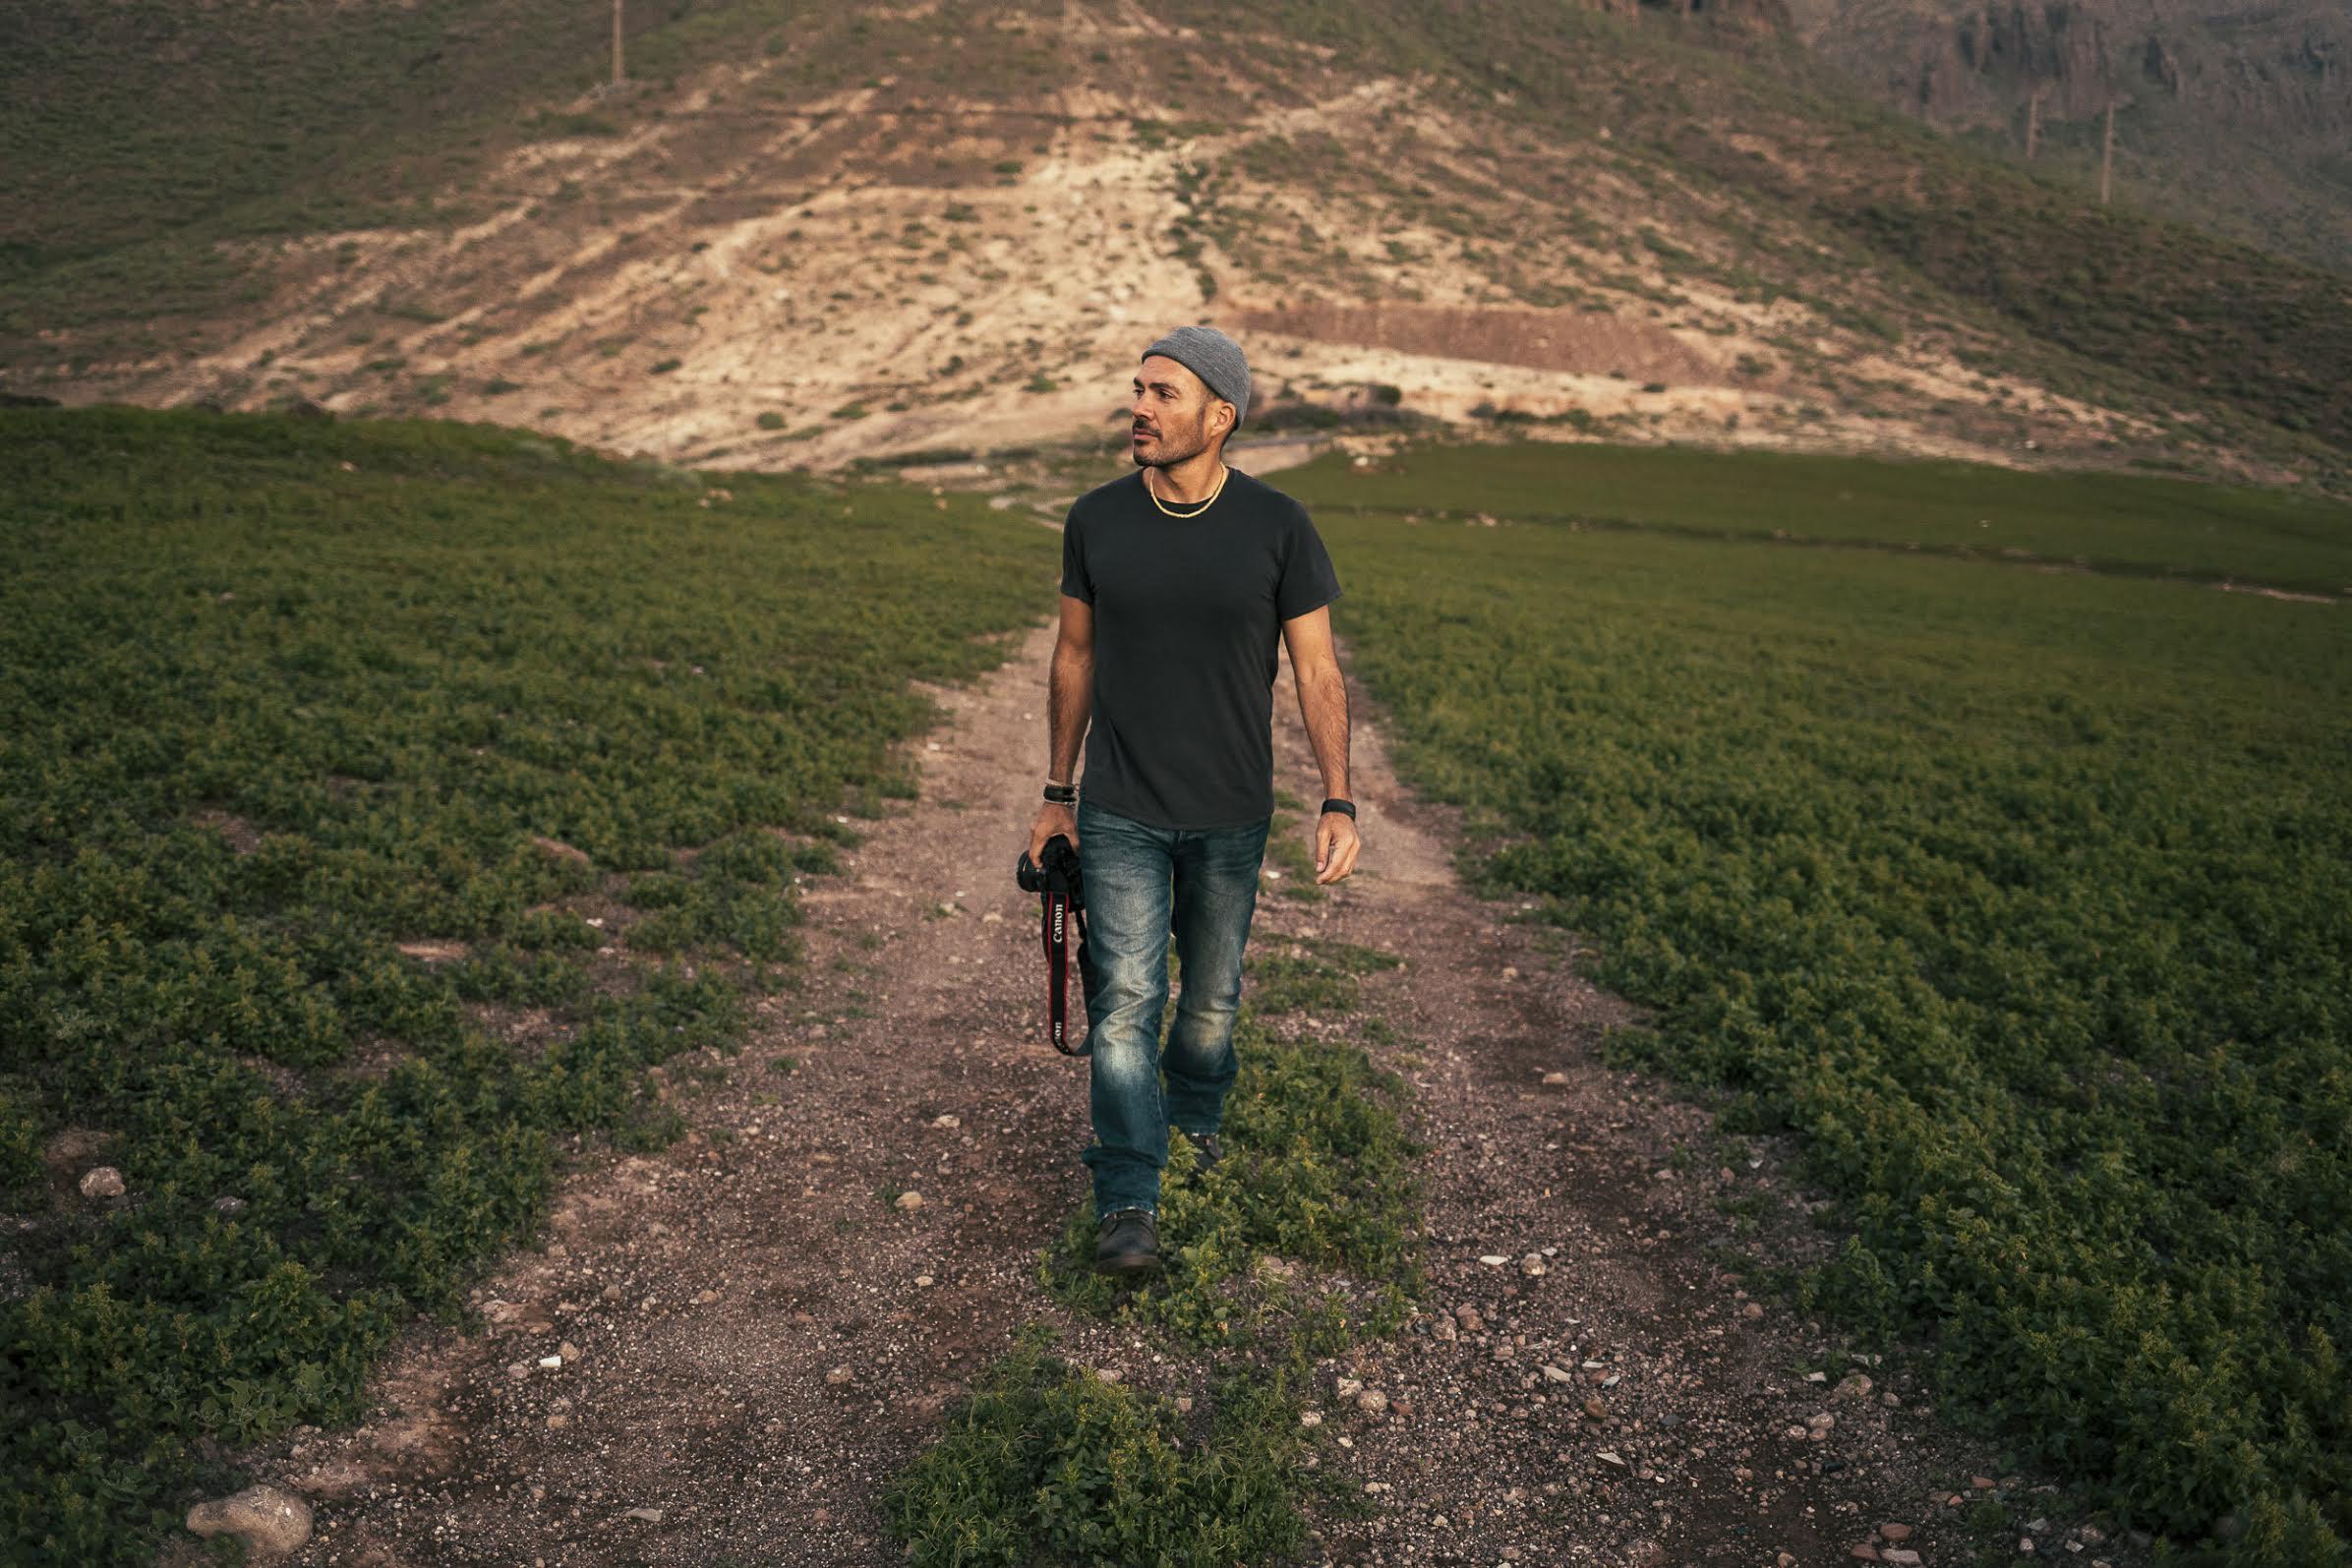 Tomás Correa. Photographer